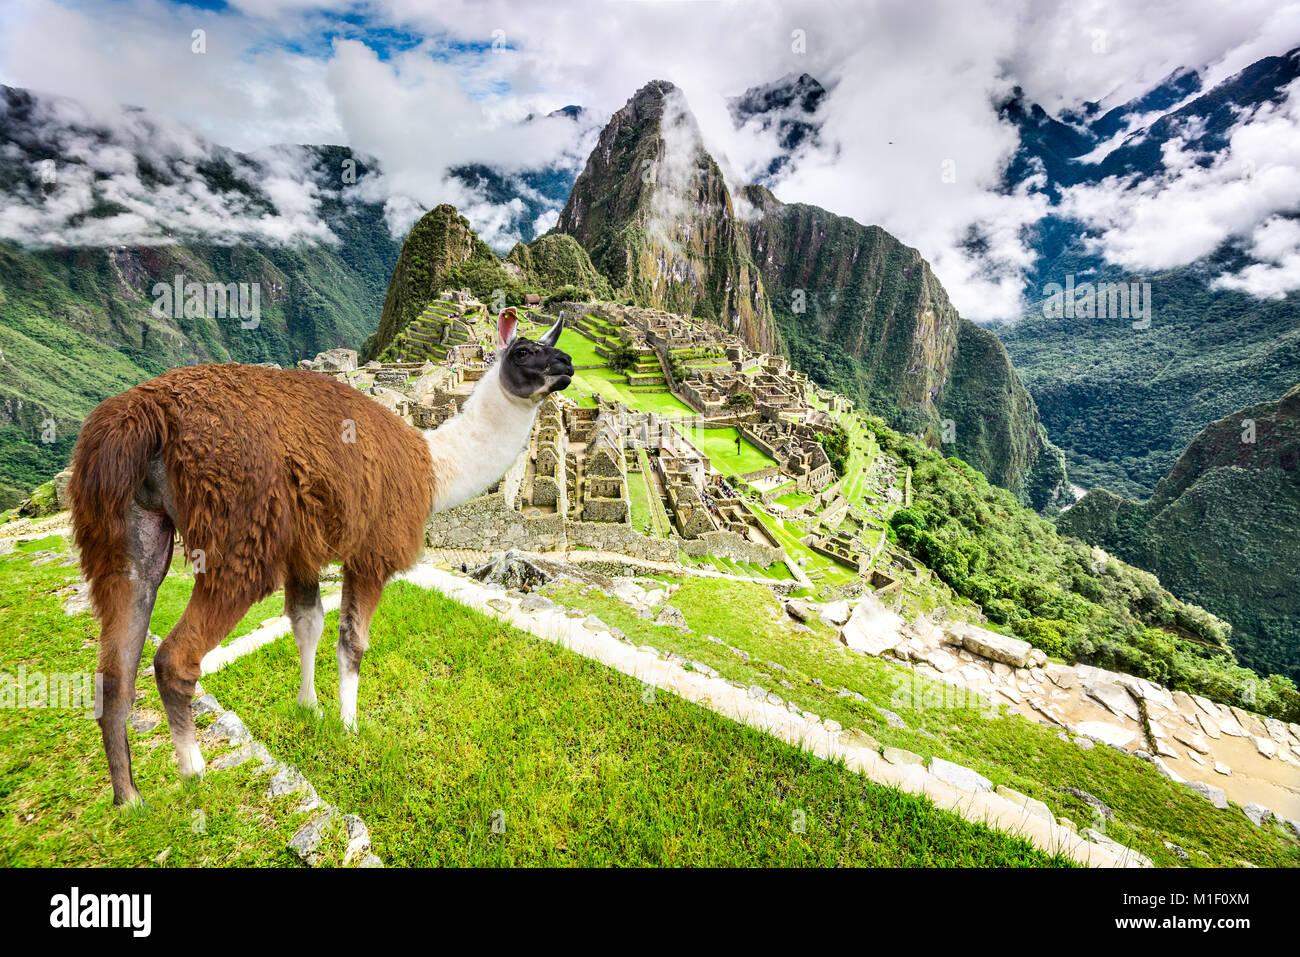 Machu Picchu, Cusco, Pérou - Empire Inca, ville et montagne Huaynapicchu, Vallée Sacrée. Amazing Photo Stock